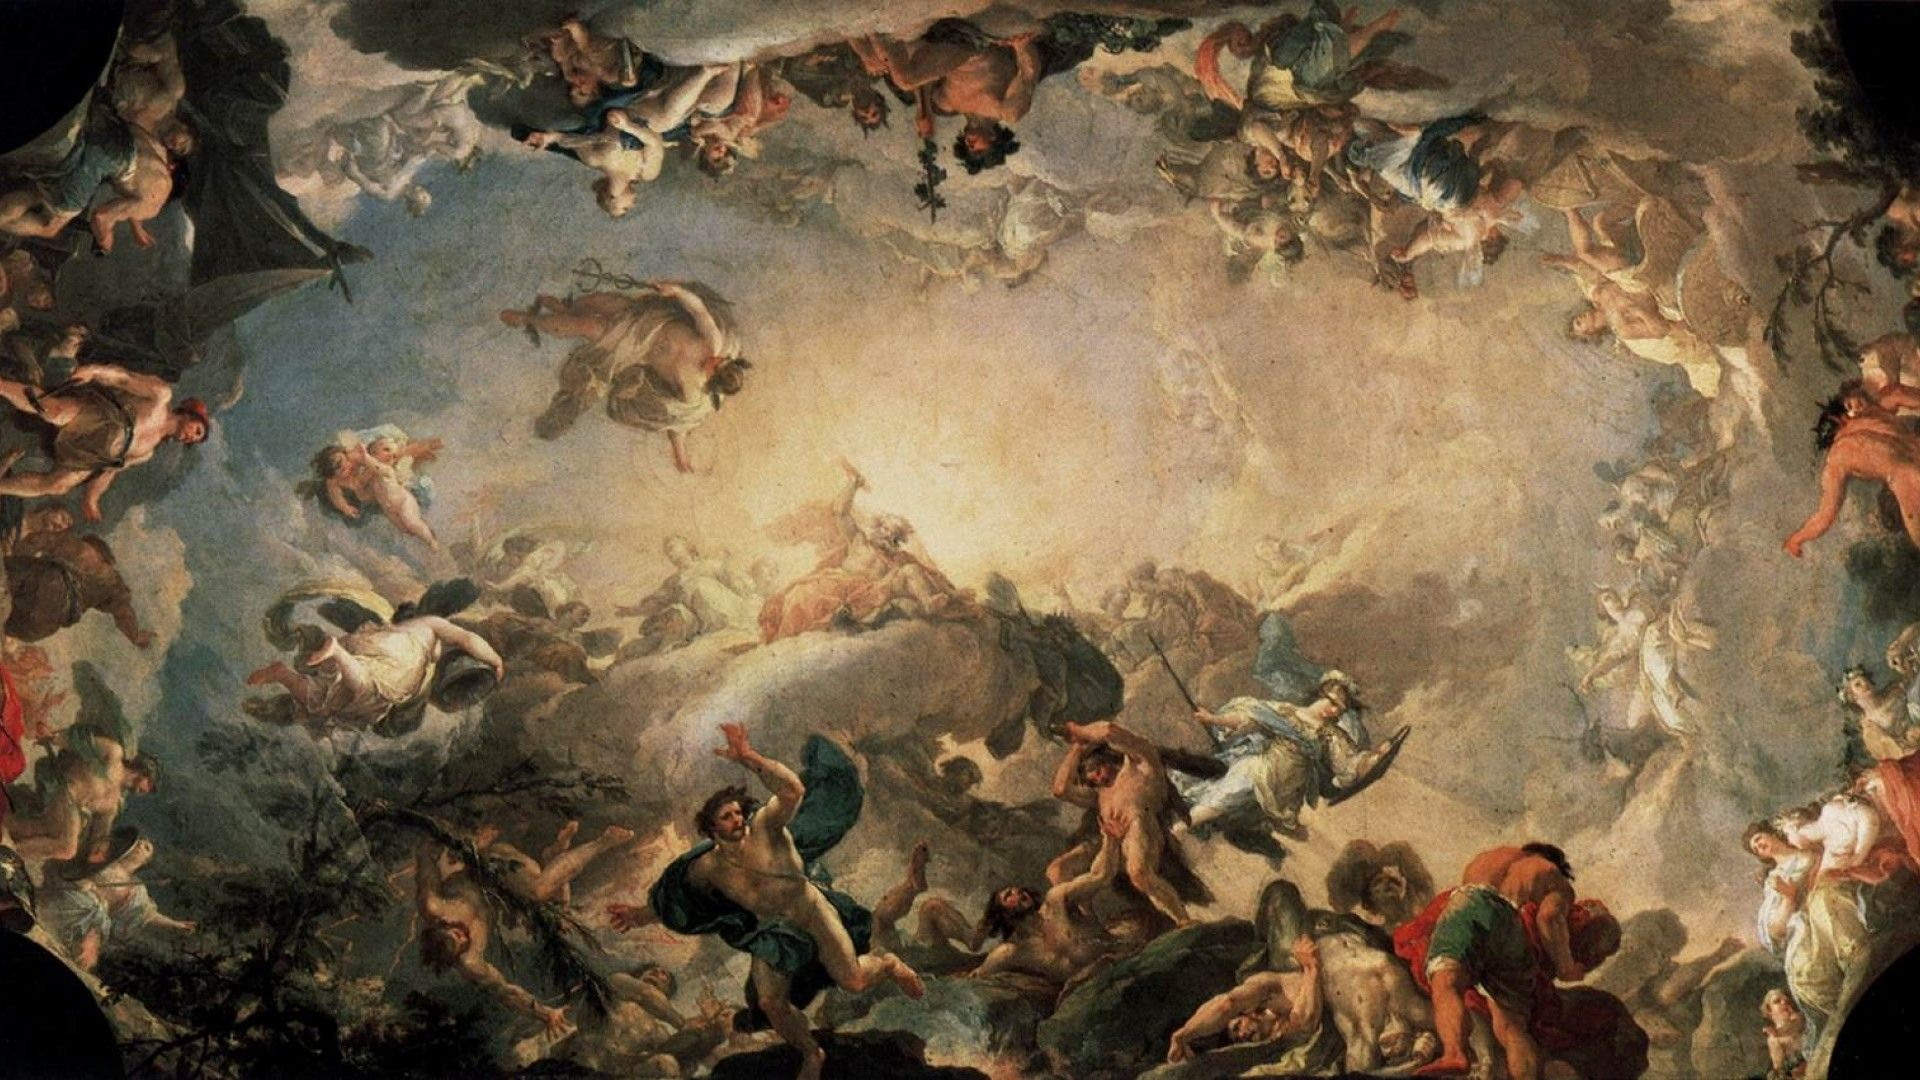 The Greek Pantheon - An Olympic Struggle